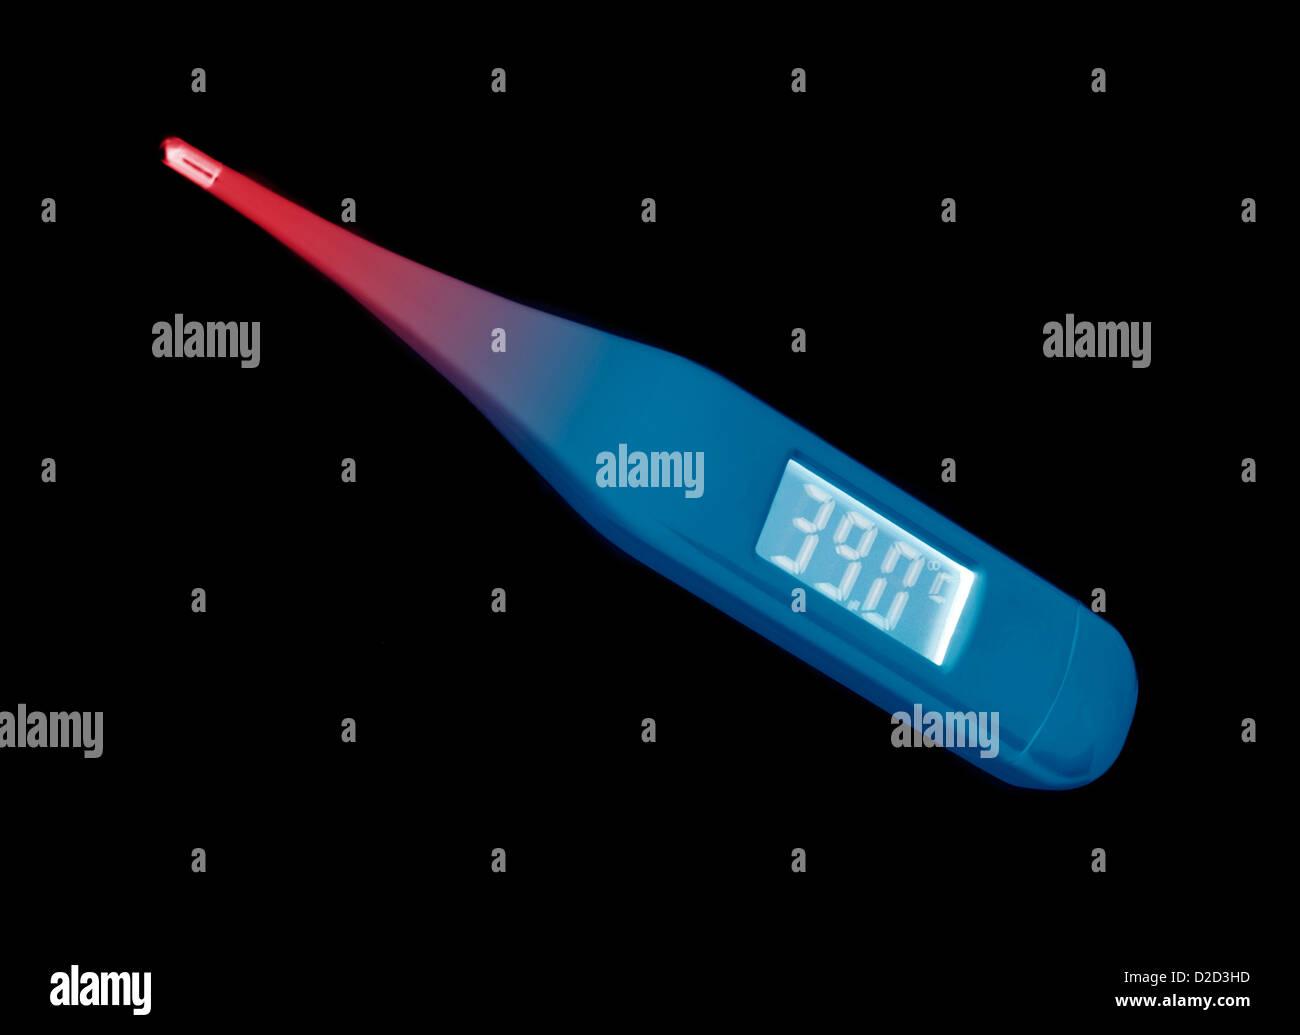 Termómetros médicos Imagen De Stock